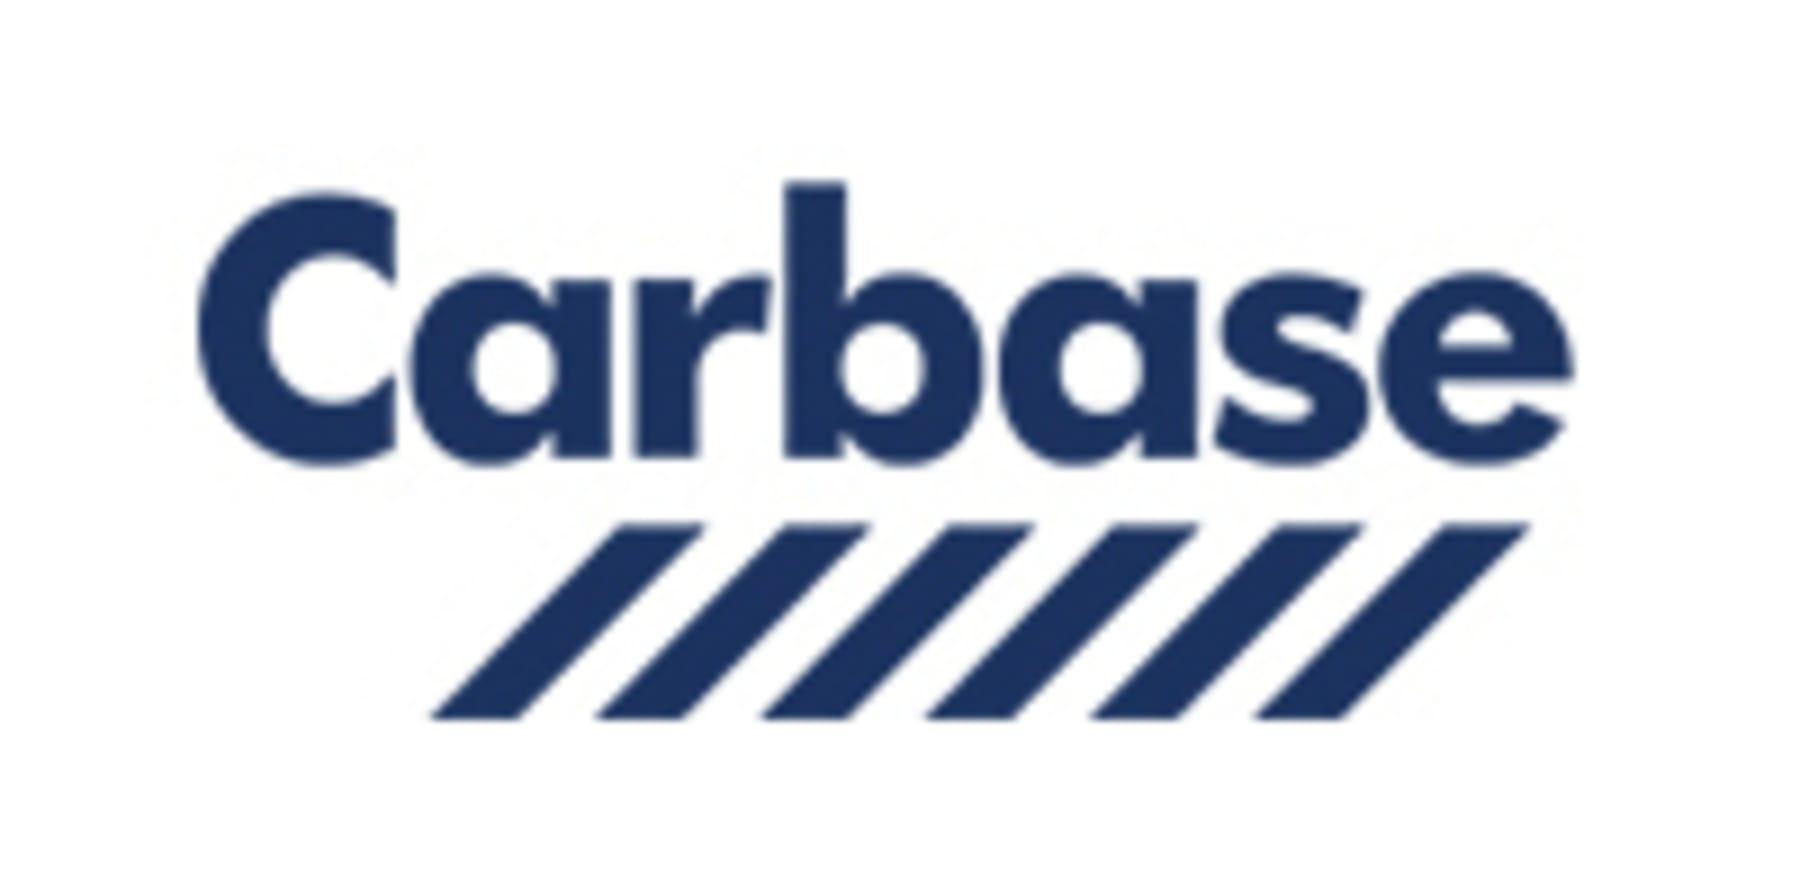 Carbase Bristol